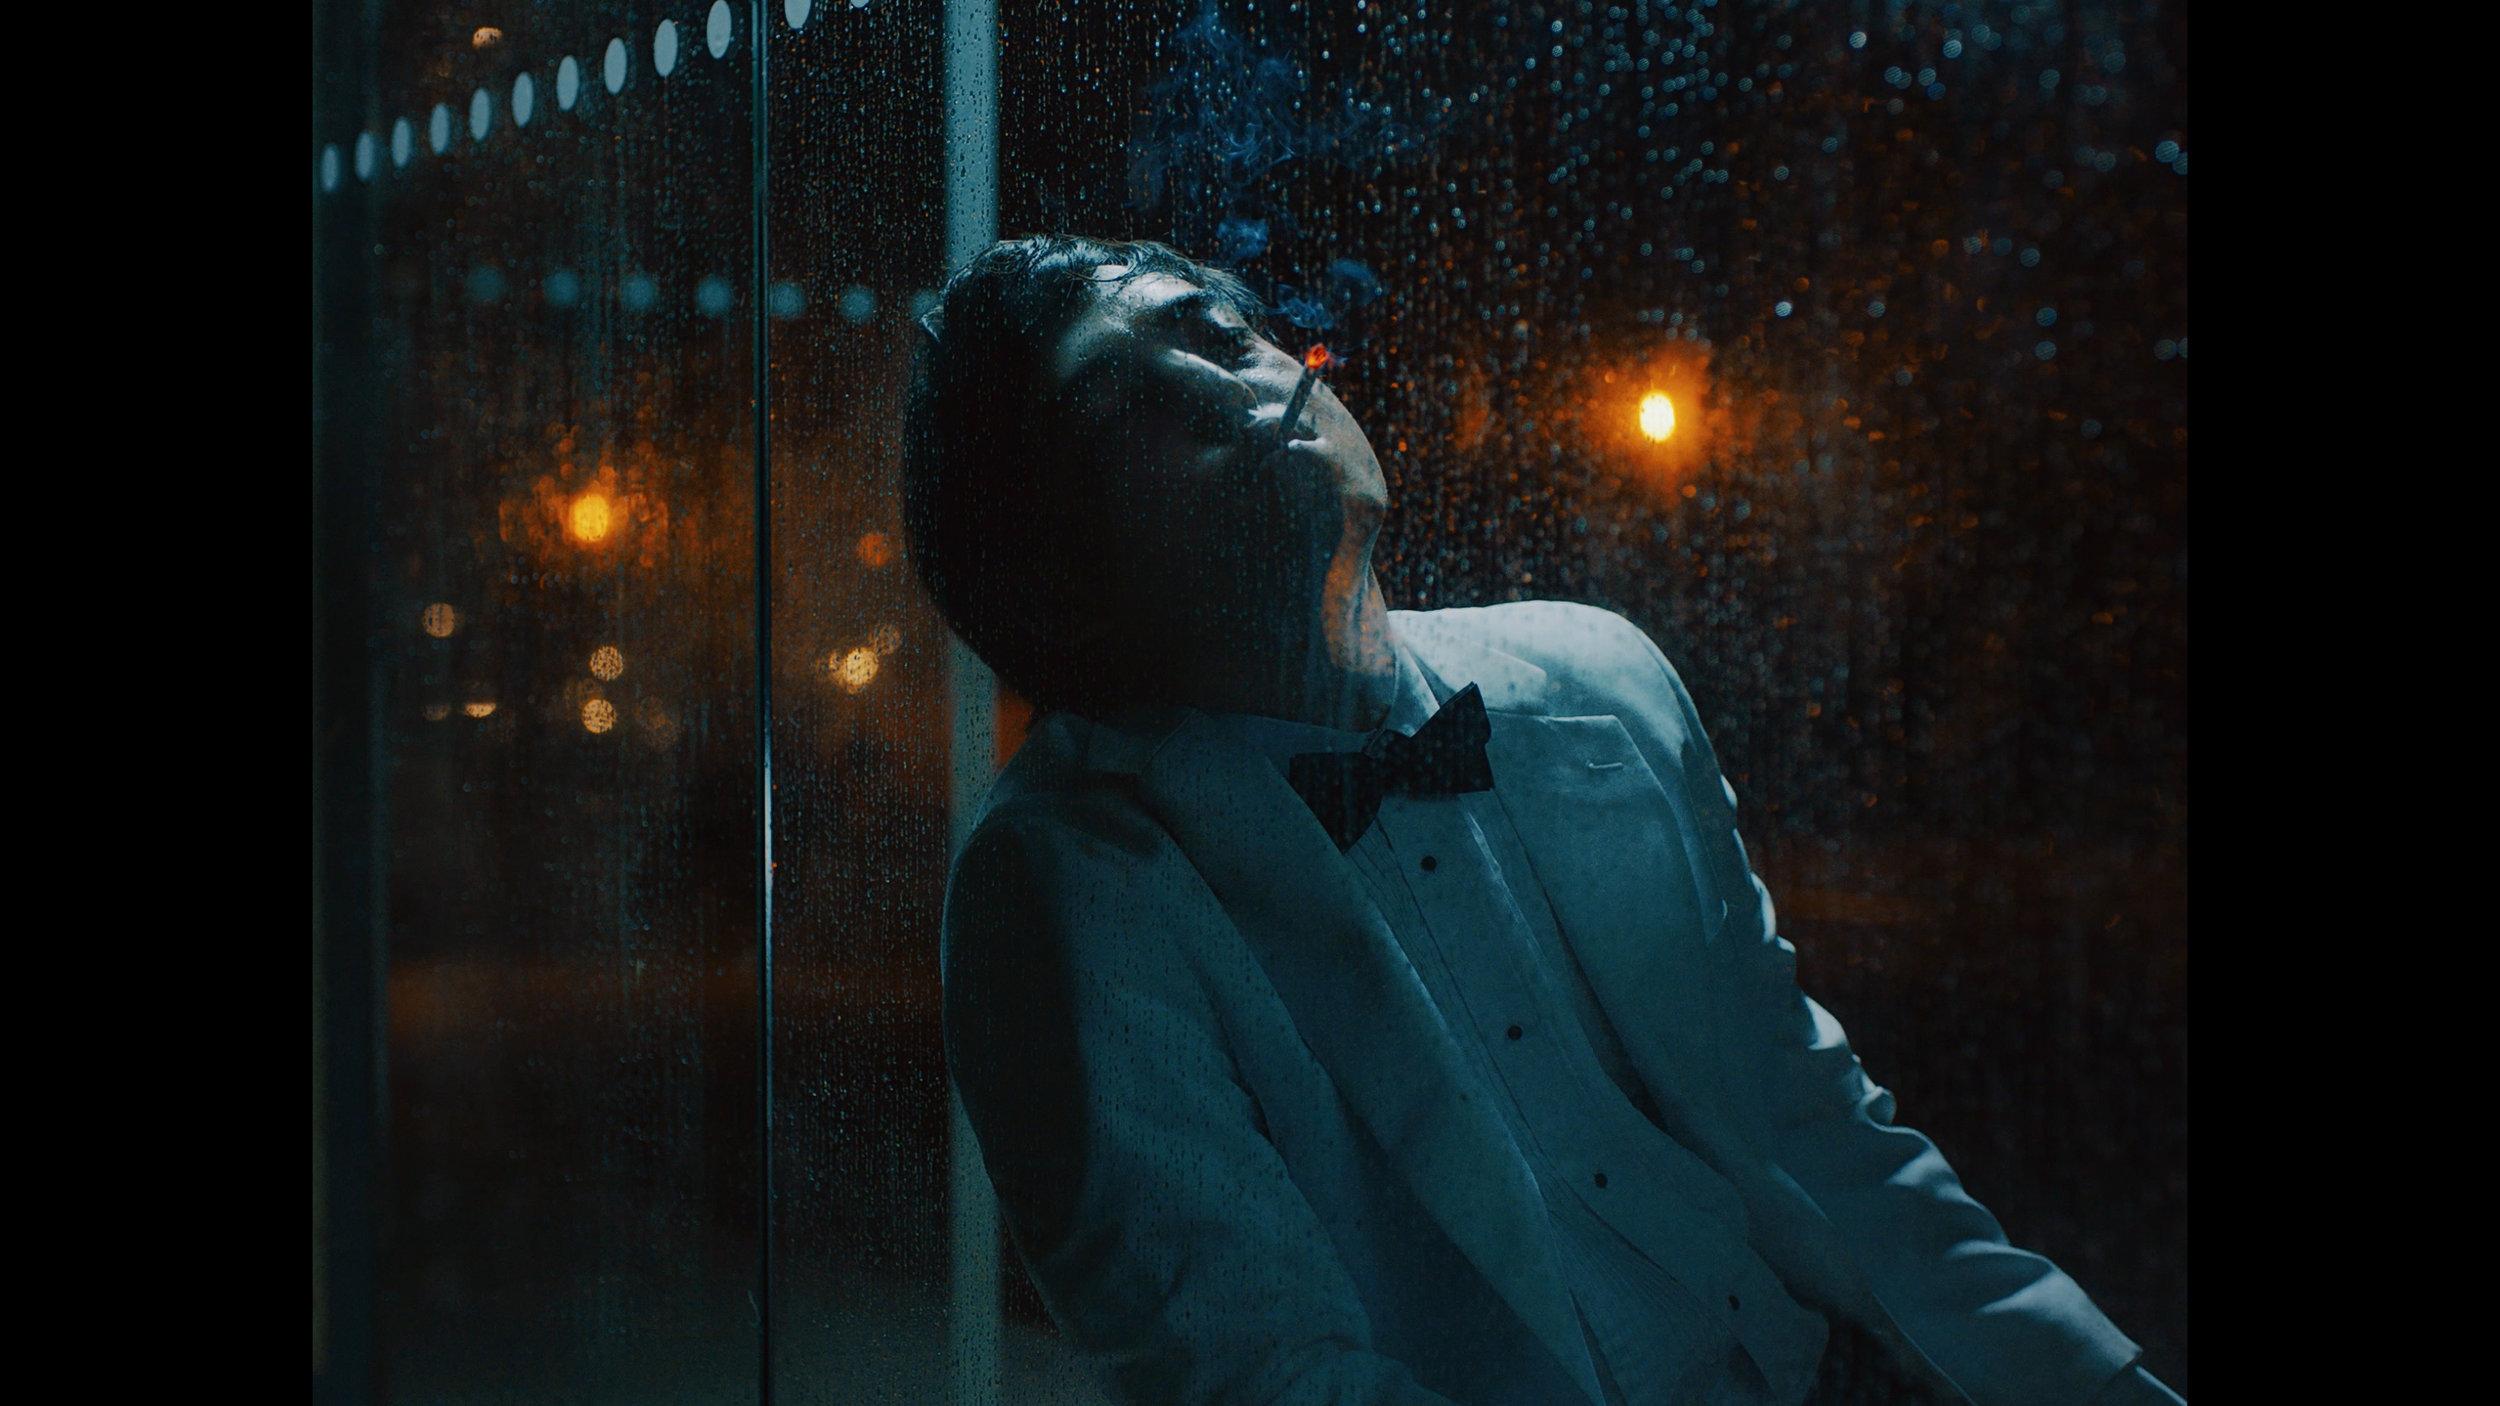 JOJI - Slow Dancing In The Dark [ Choreographer ]